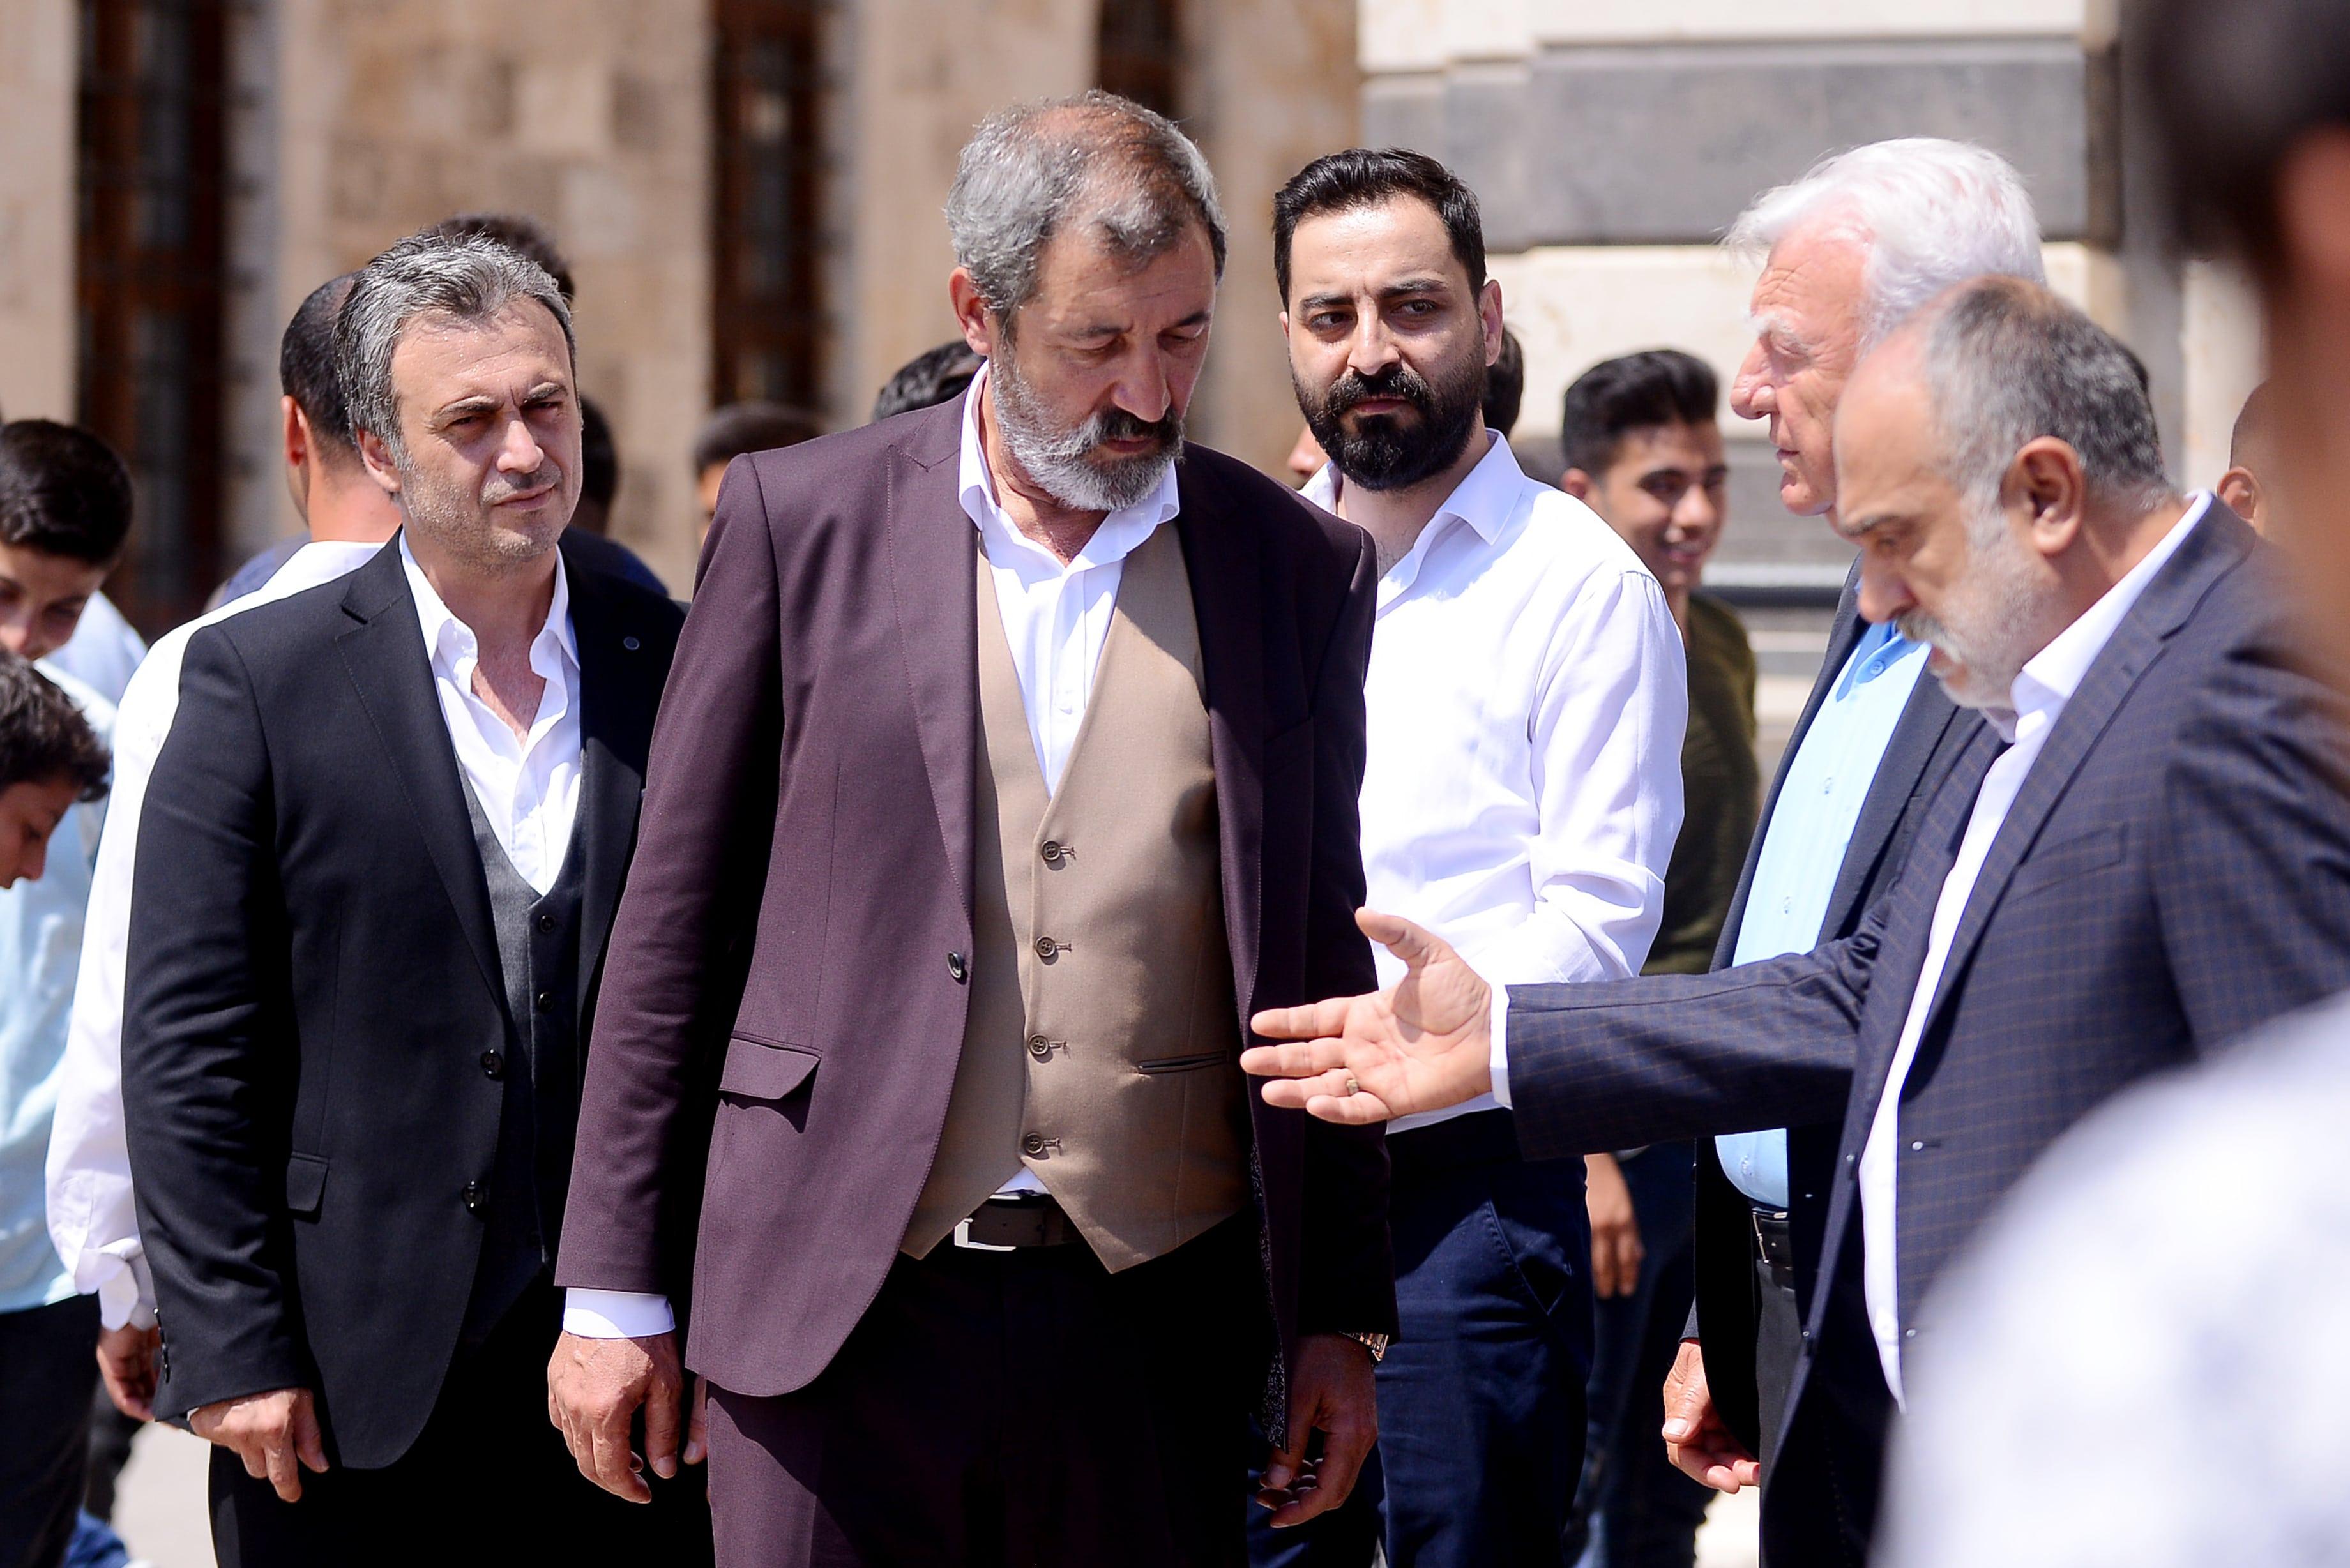 Benim Adim Melek: Season 1, Episode 1 Photo